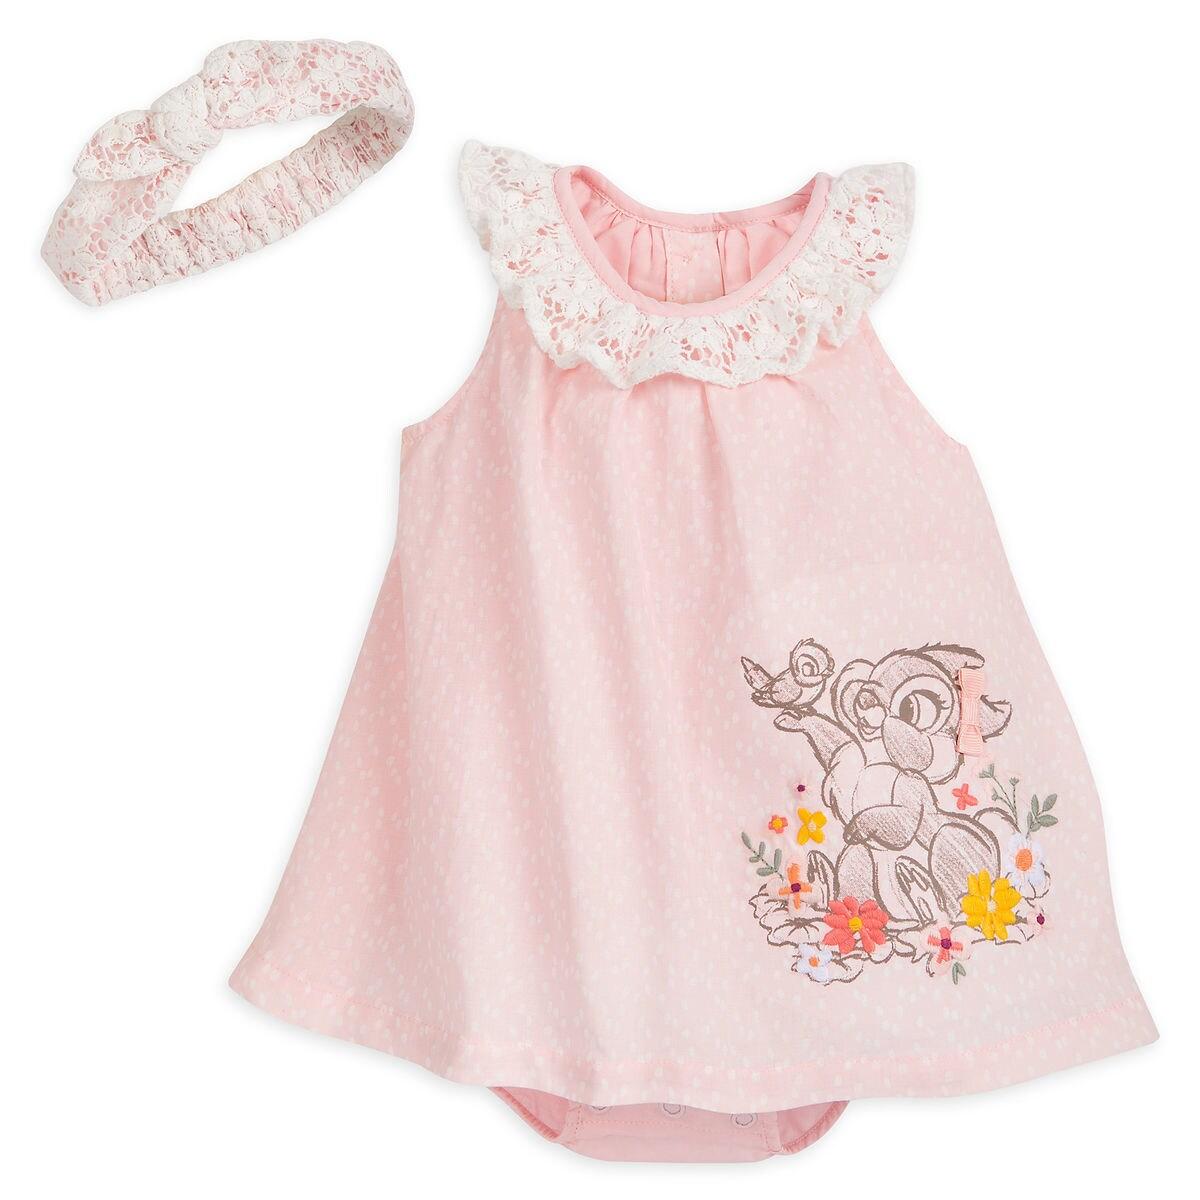 59e7f44b6 Miss Bunny Romper Dress Set for Baby